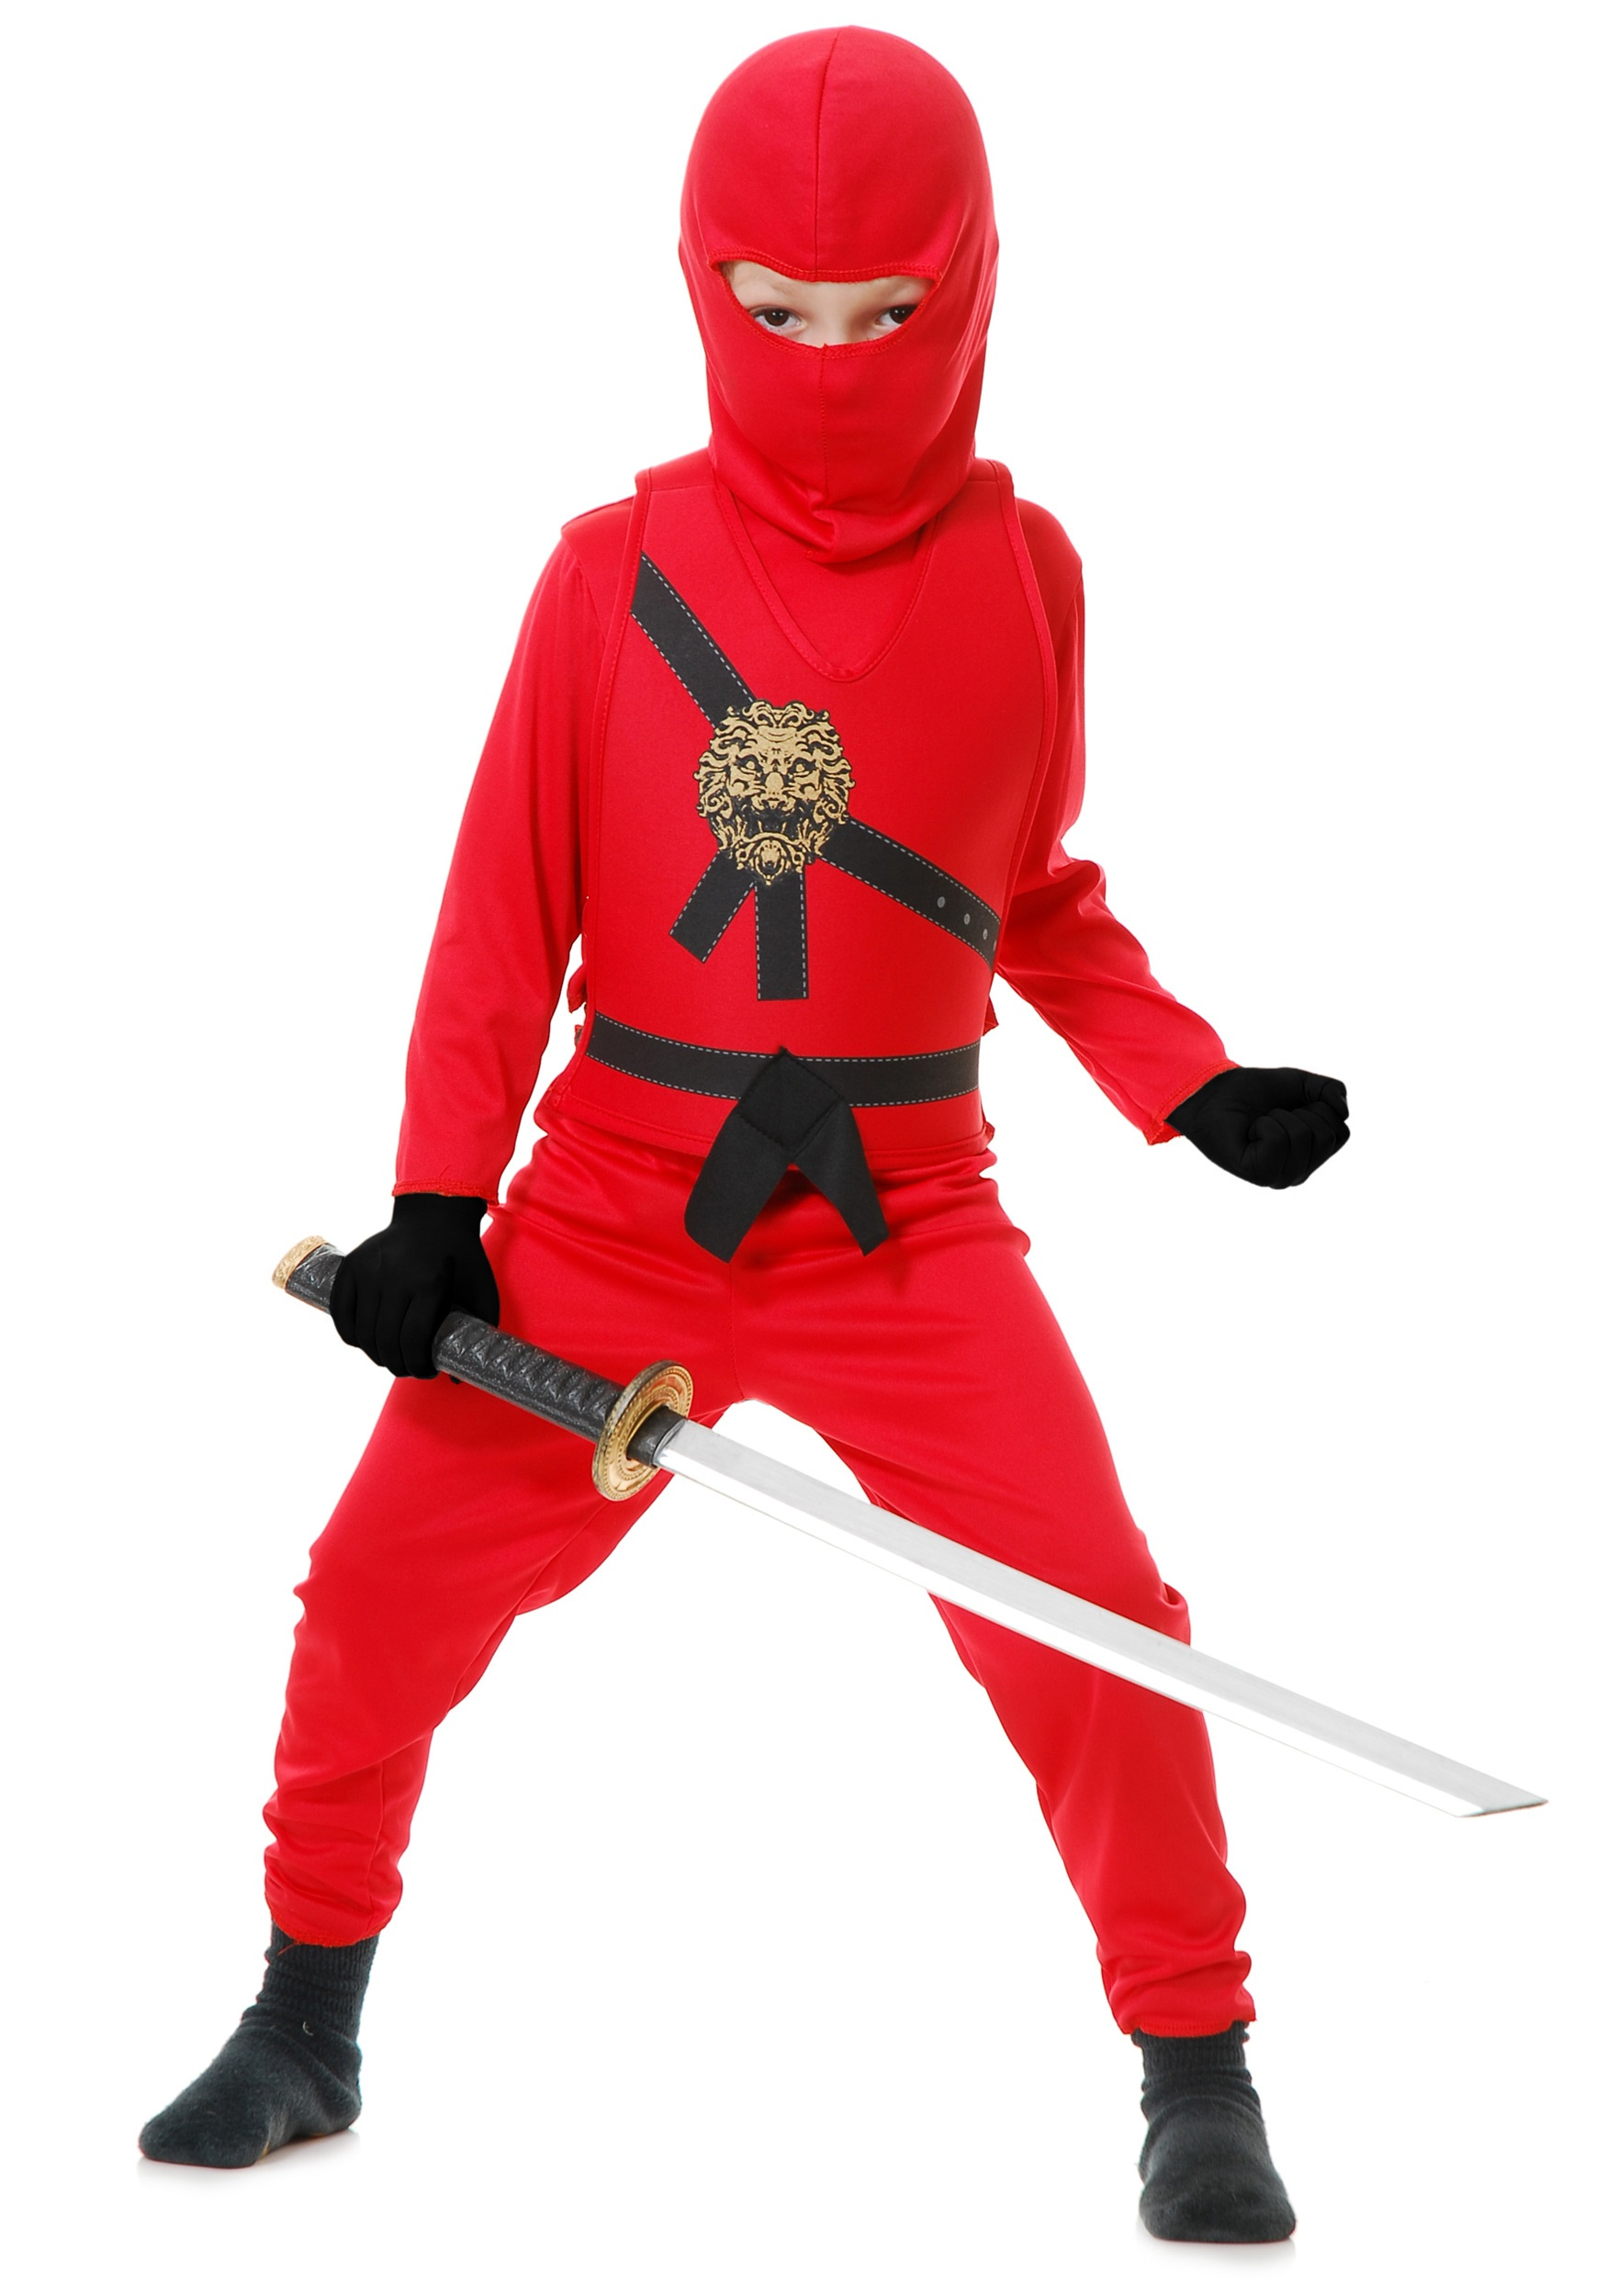 Boys Red Ninja Master Warrior Costume | Ninja Warrior Costume